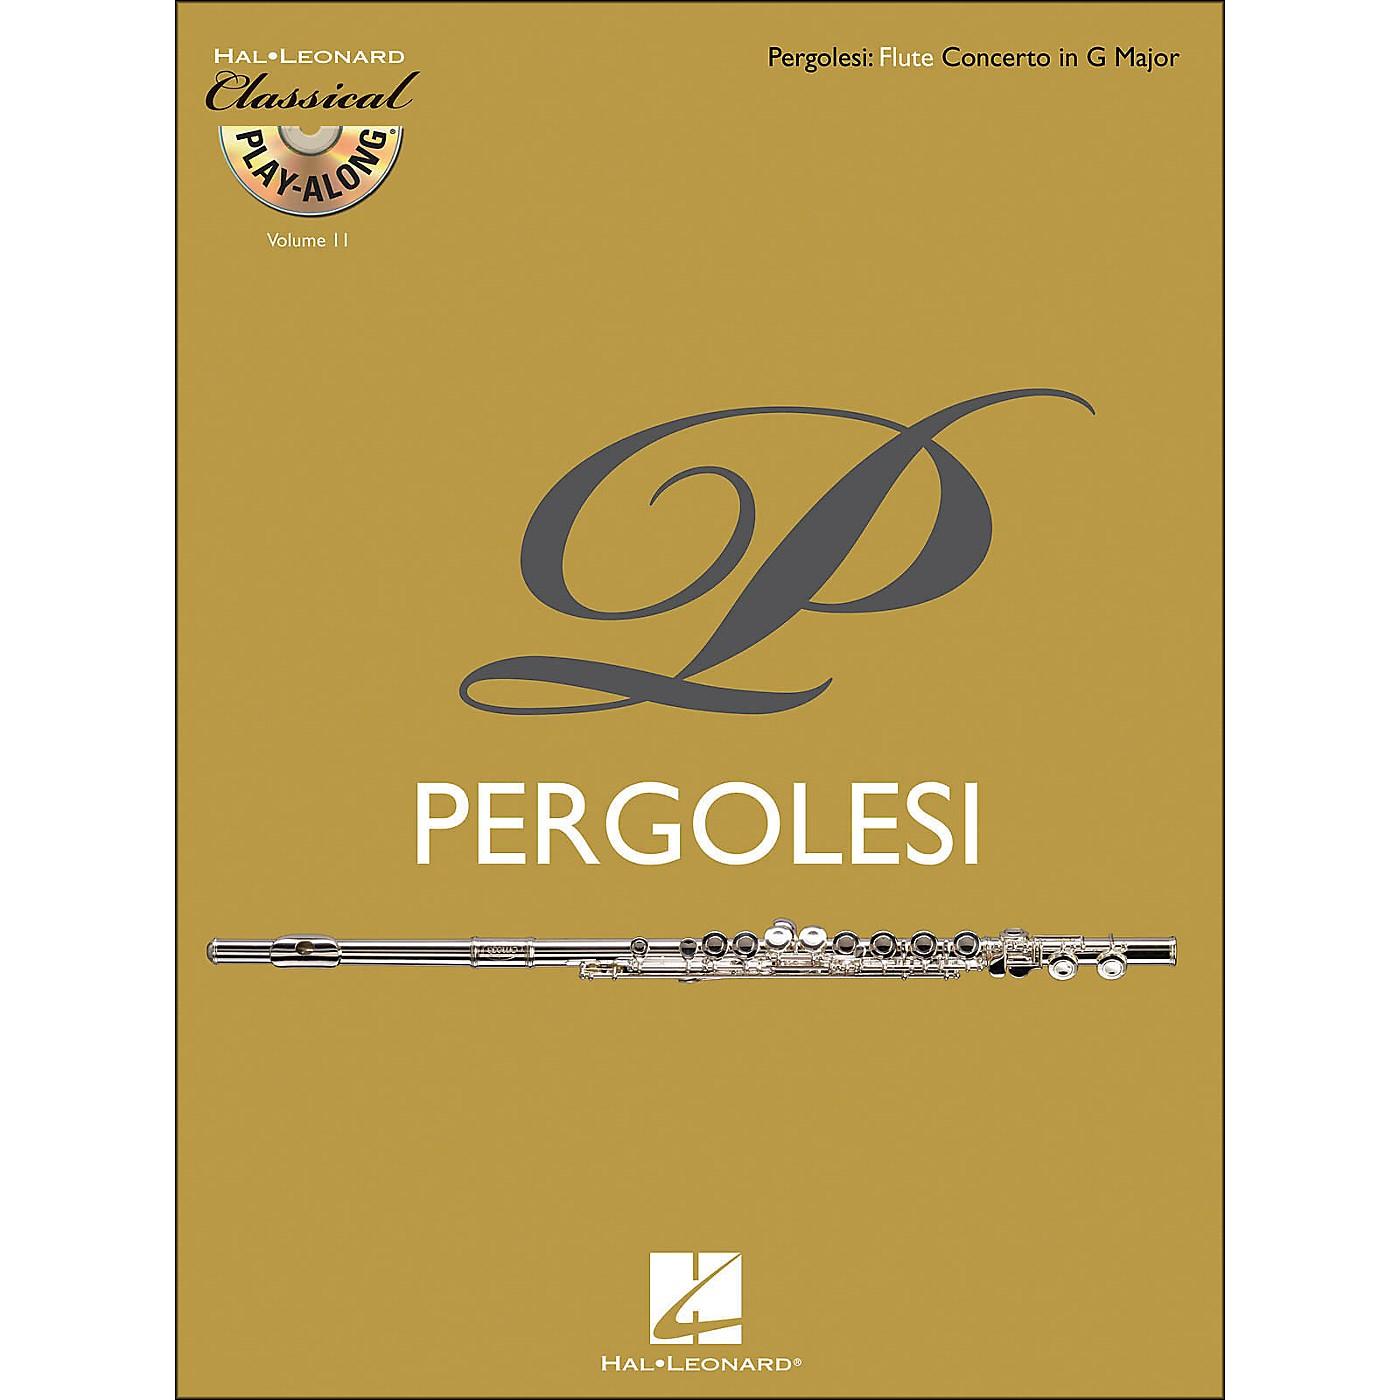 Hal Leonard Pergolesi: Flute Concerto In G Major Classical Play-Along Book/CD Vol. 11 thumbnail